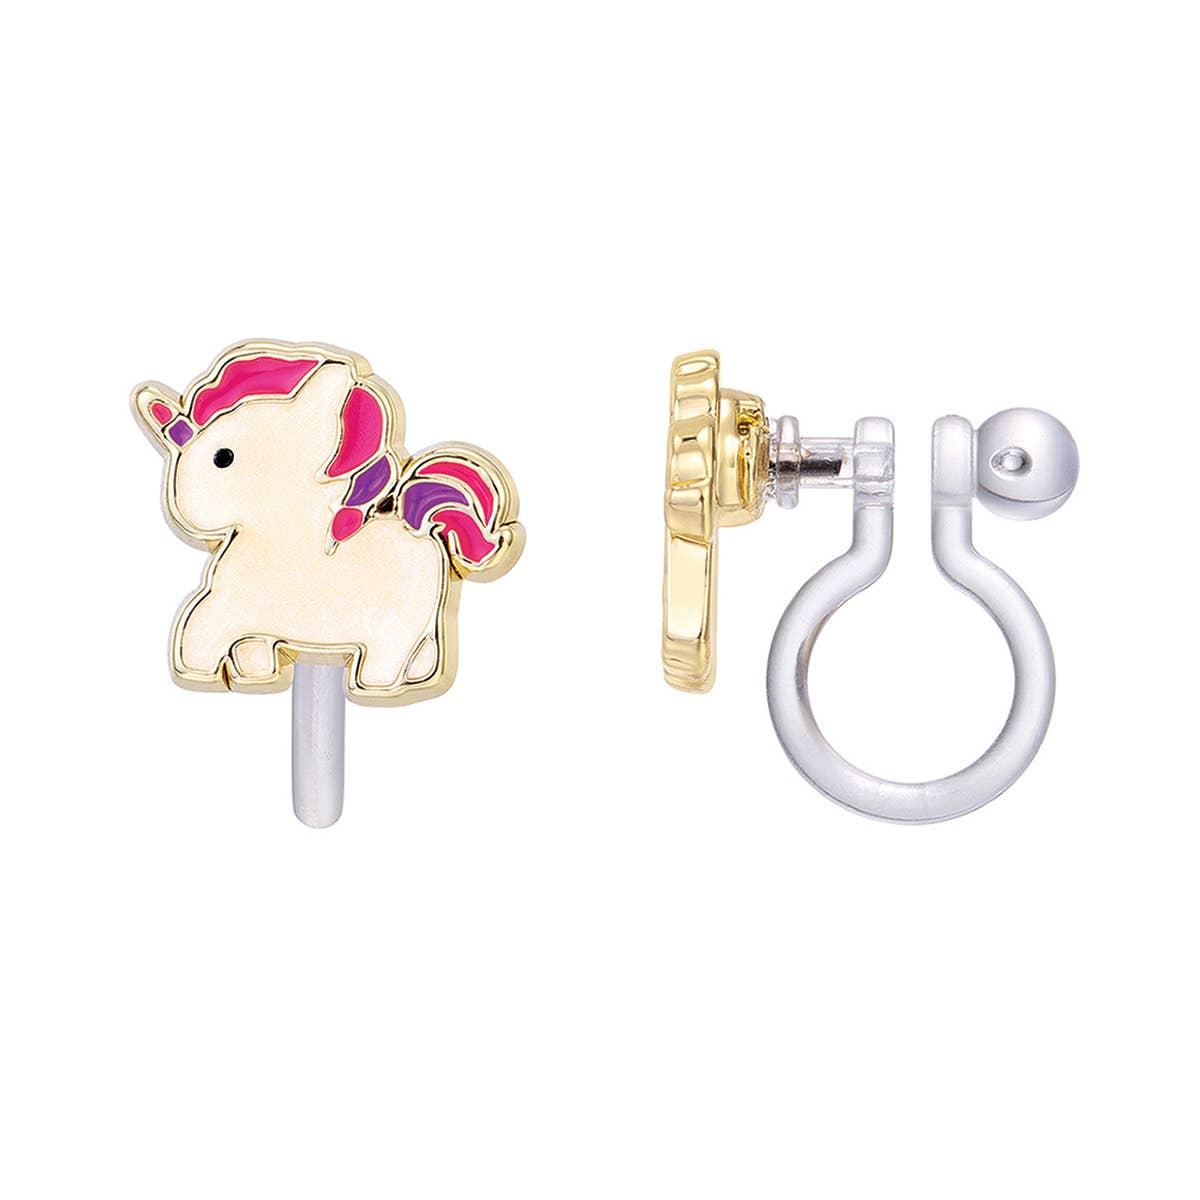 CLIP ON Cutie Earrings- Magical Unicorn | Trada Marketplace